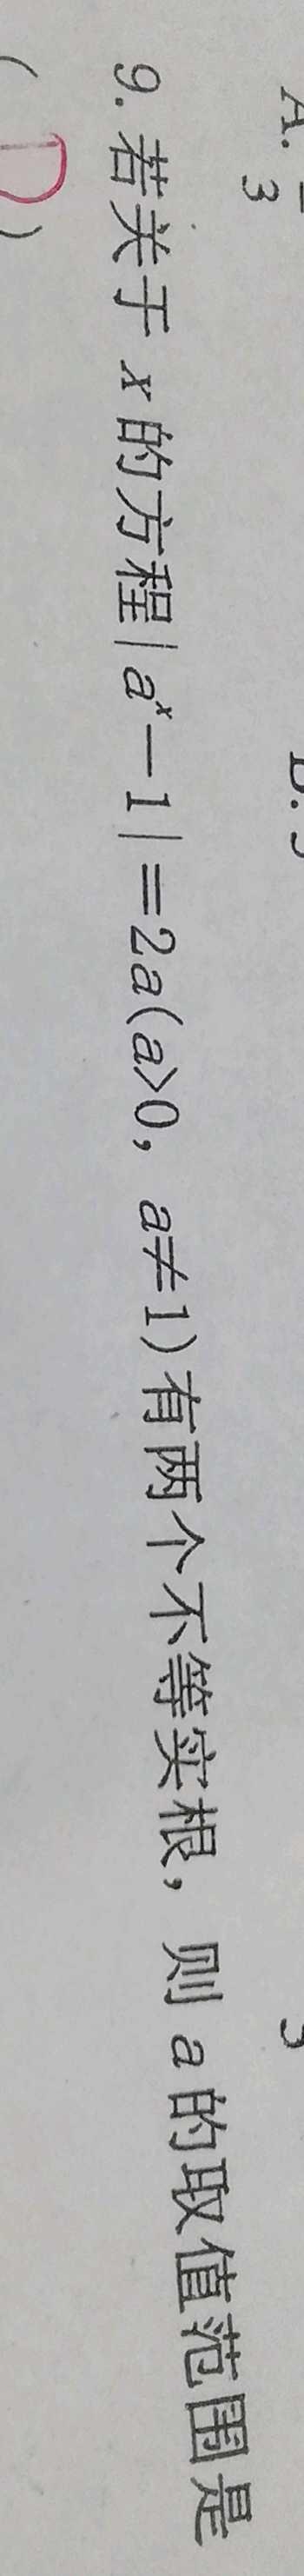 IMG_20181102_075918.jpg